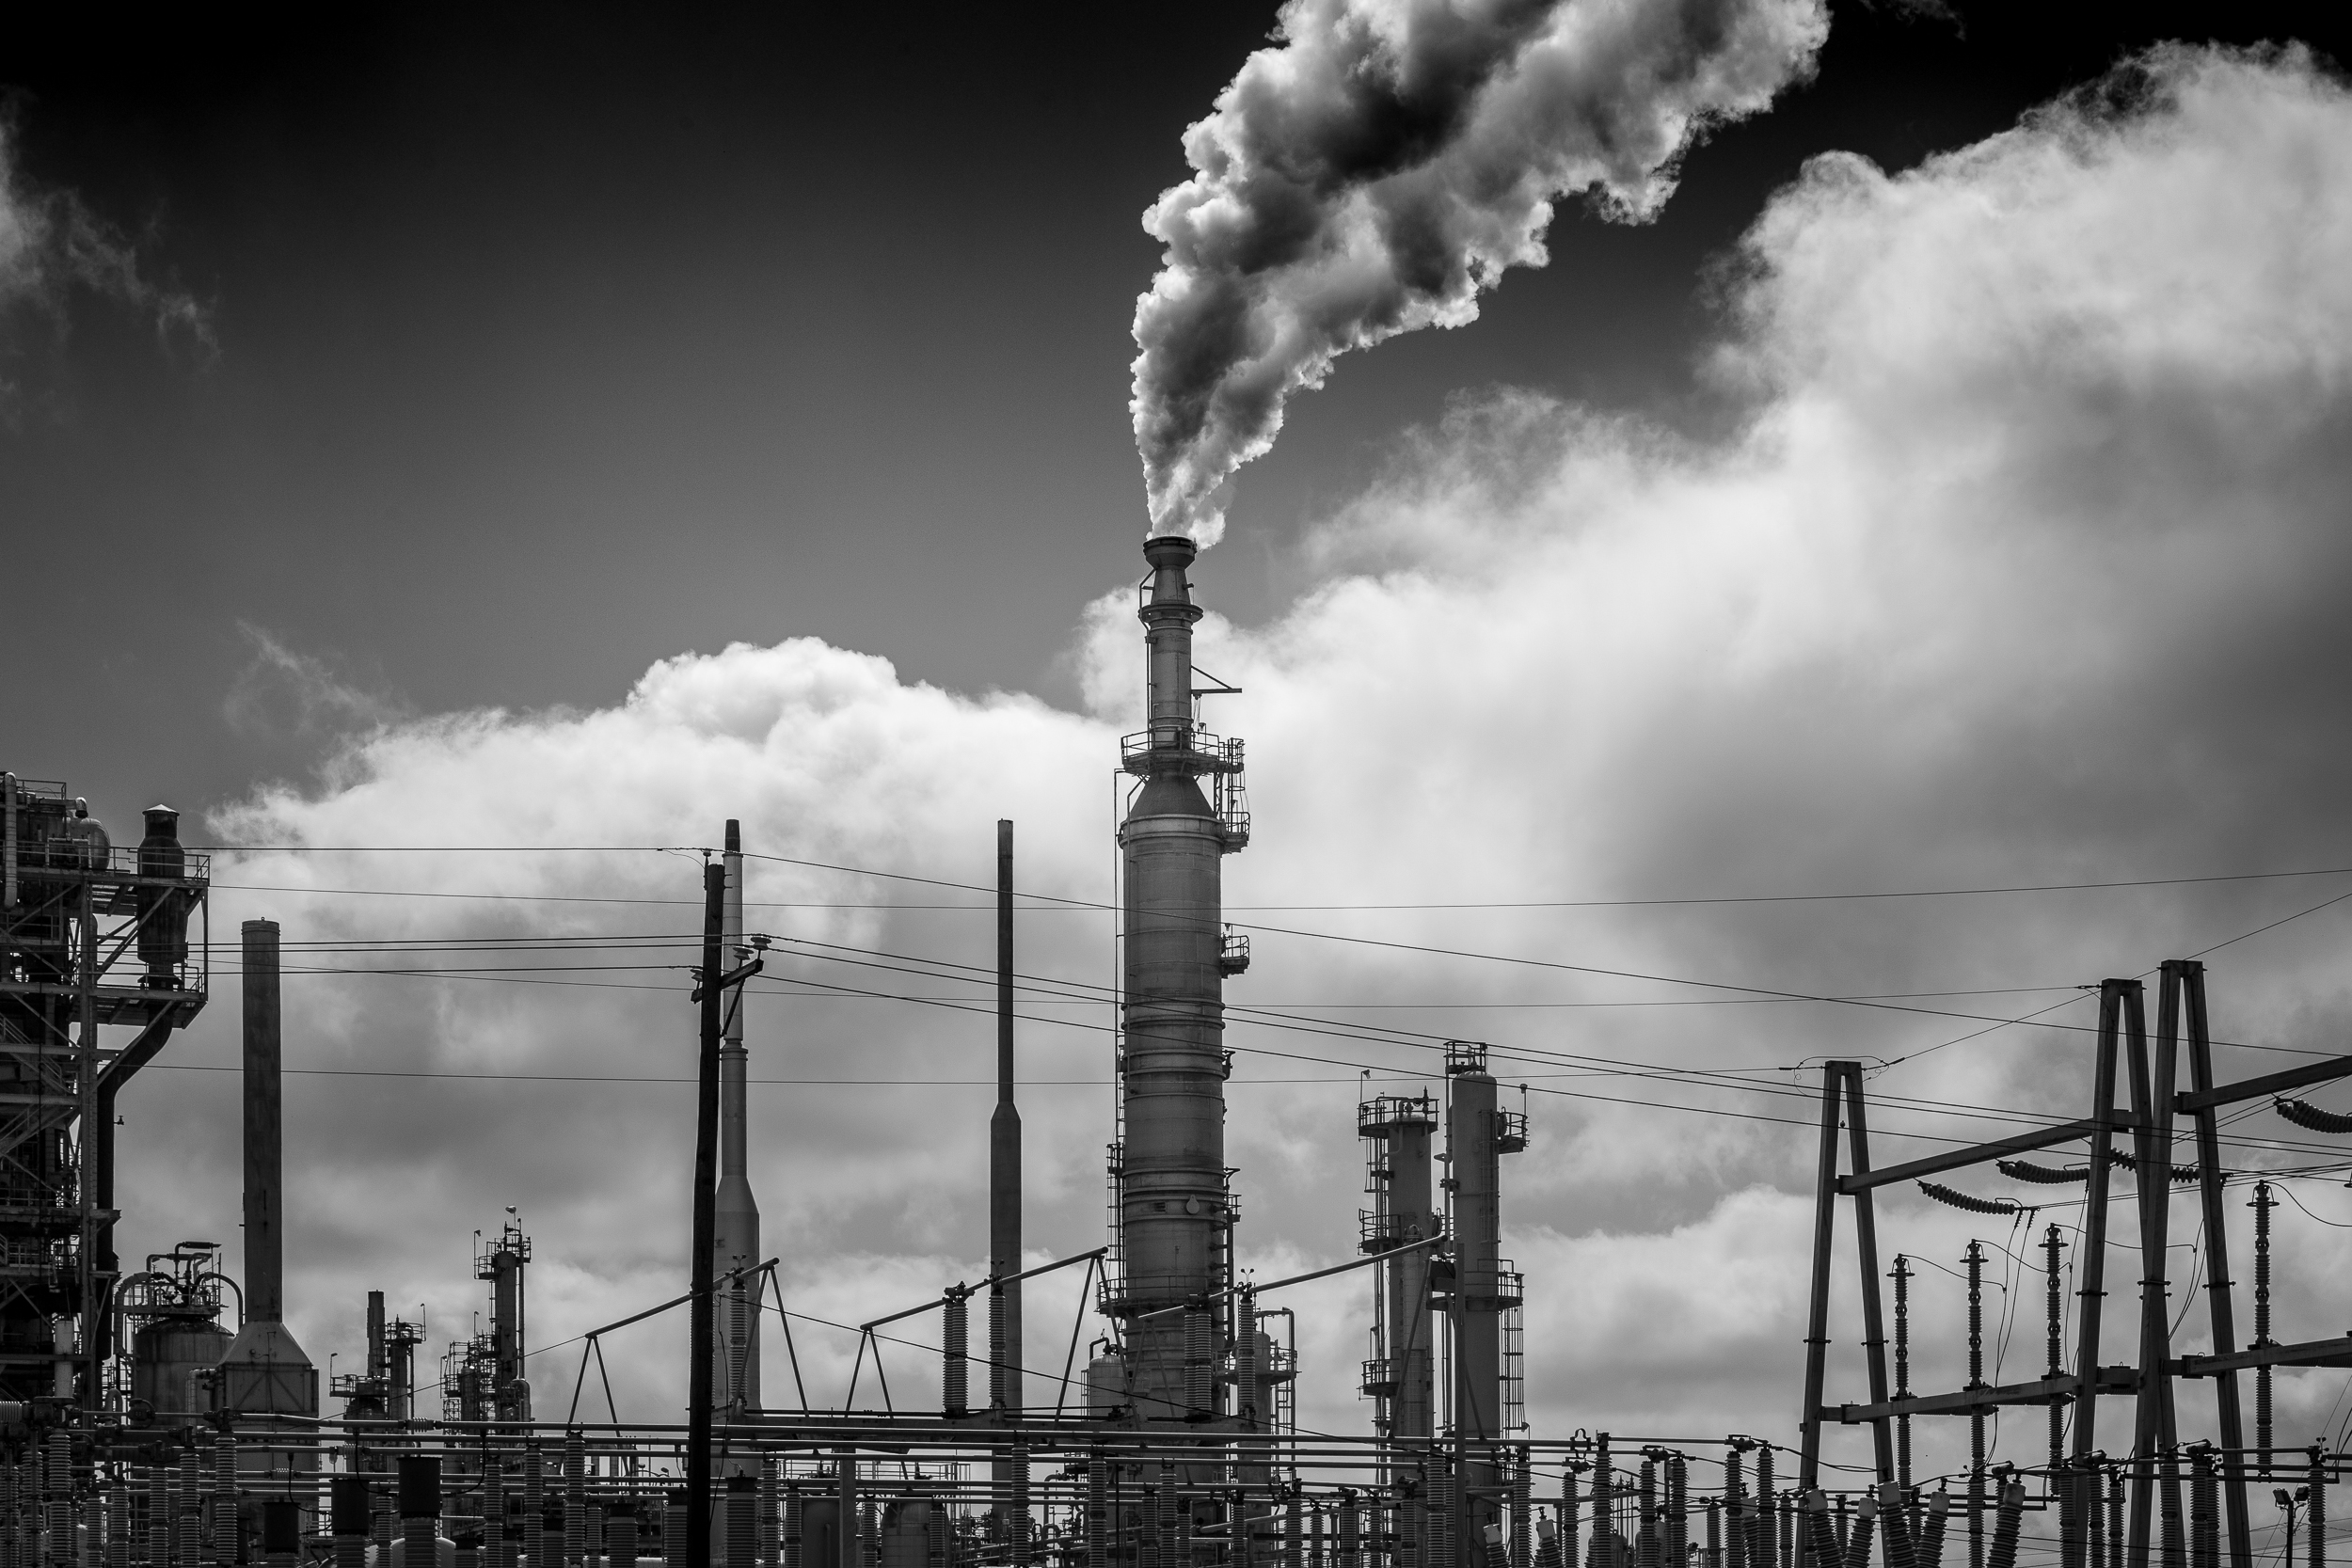 Oil refinery, Baton Rouge, Louisiana.